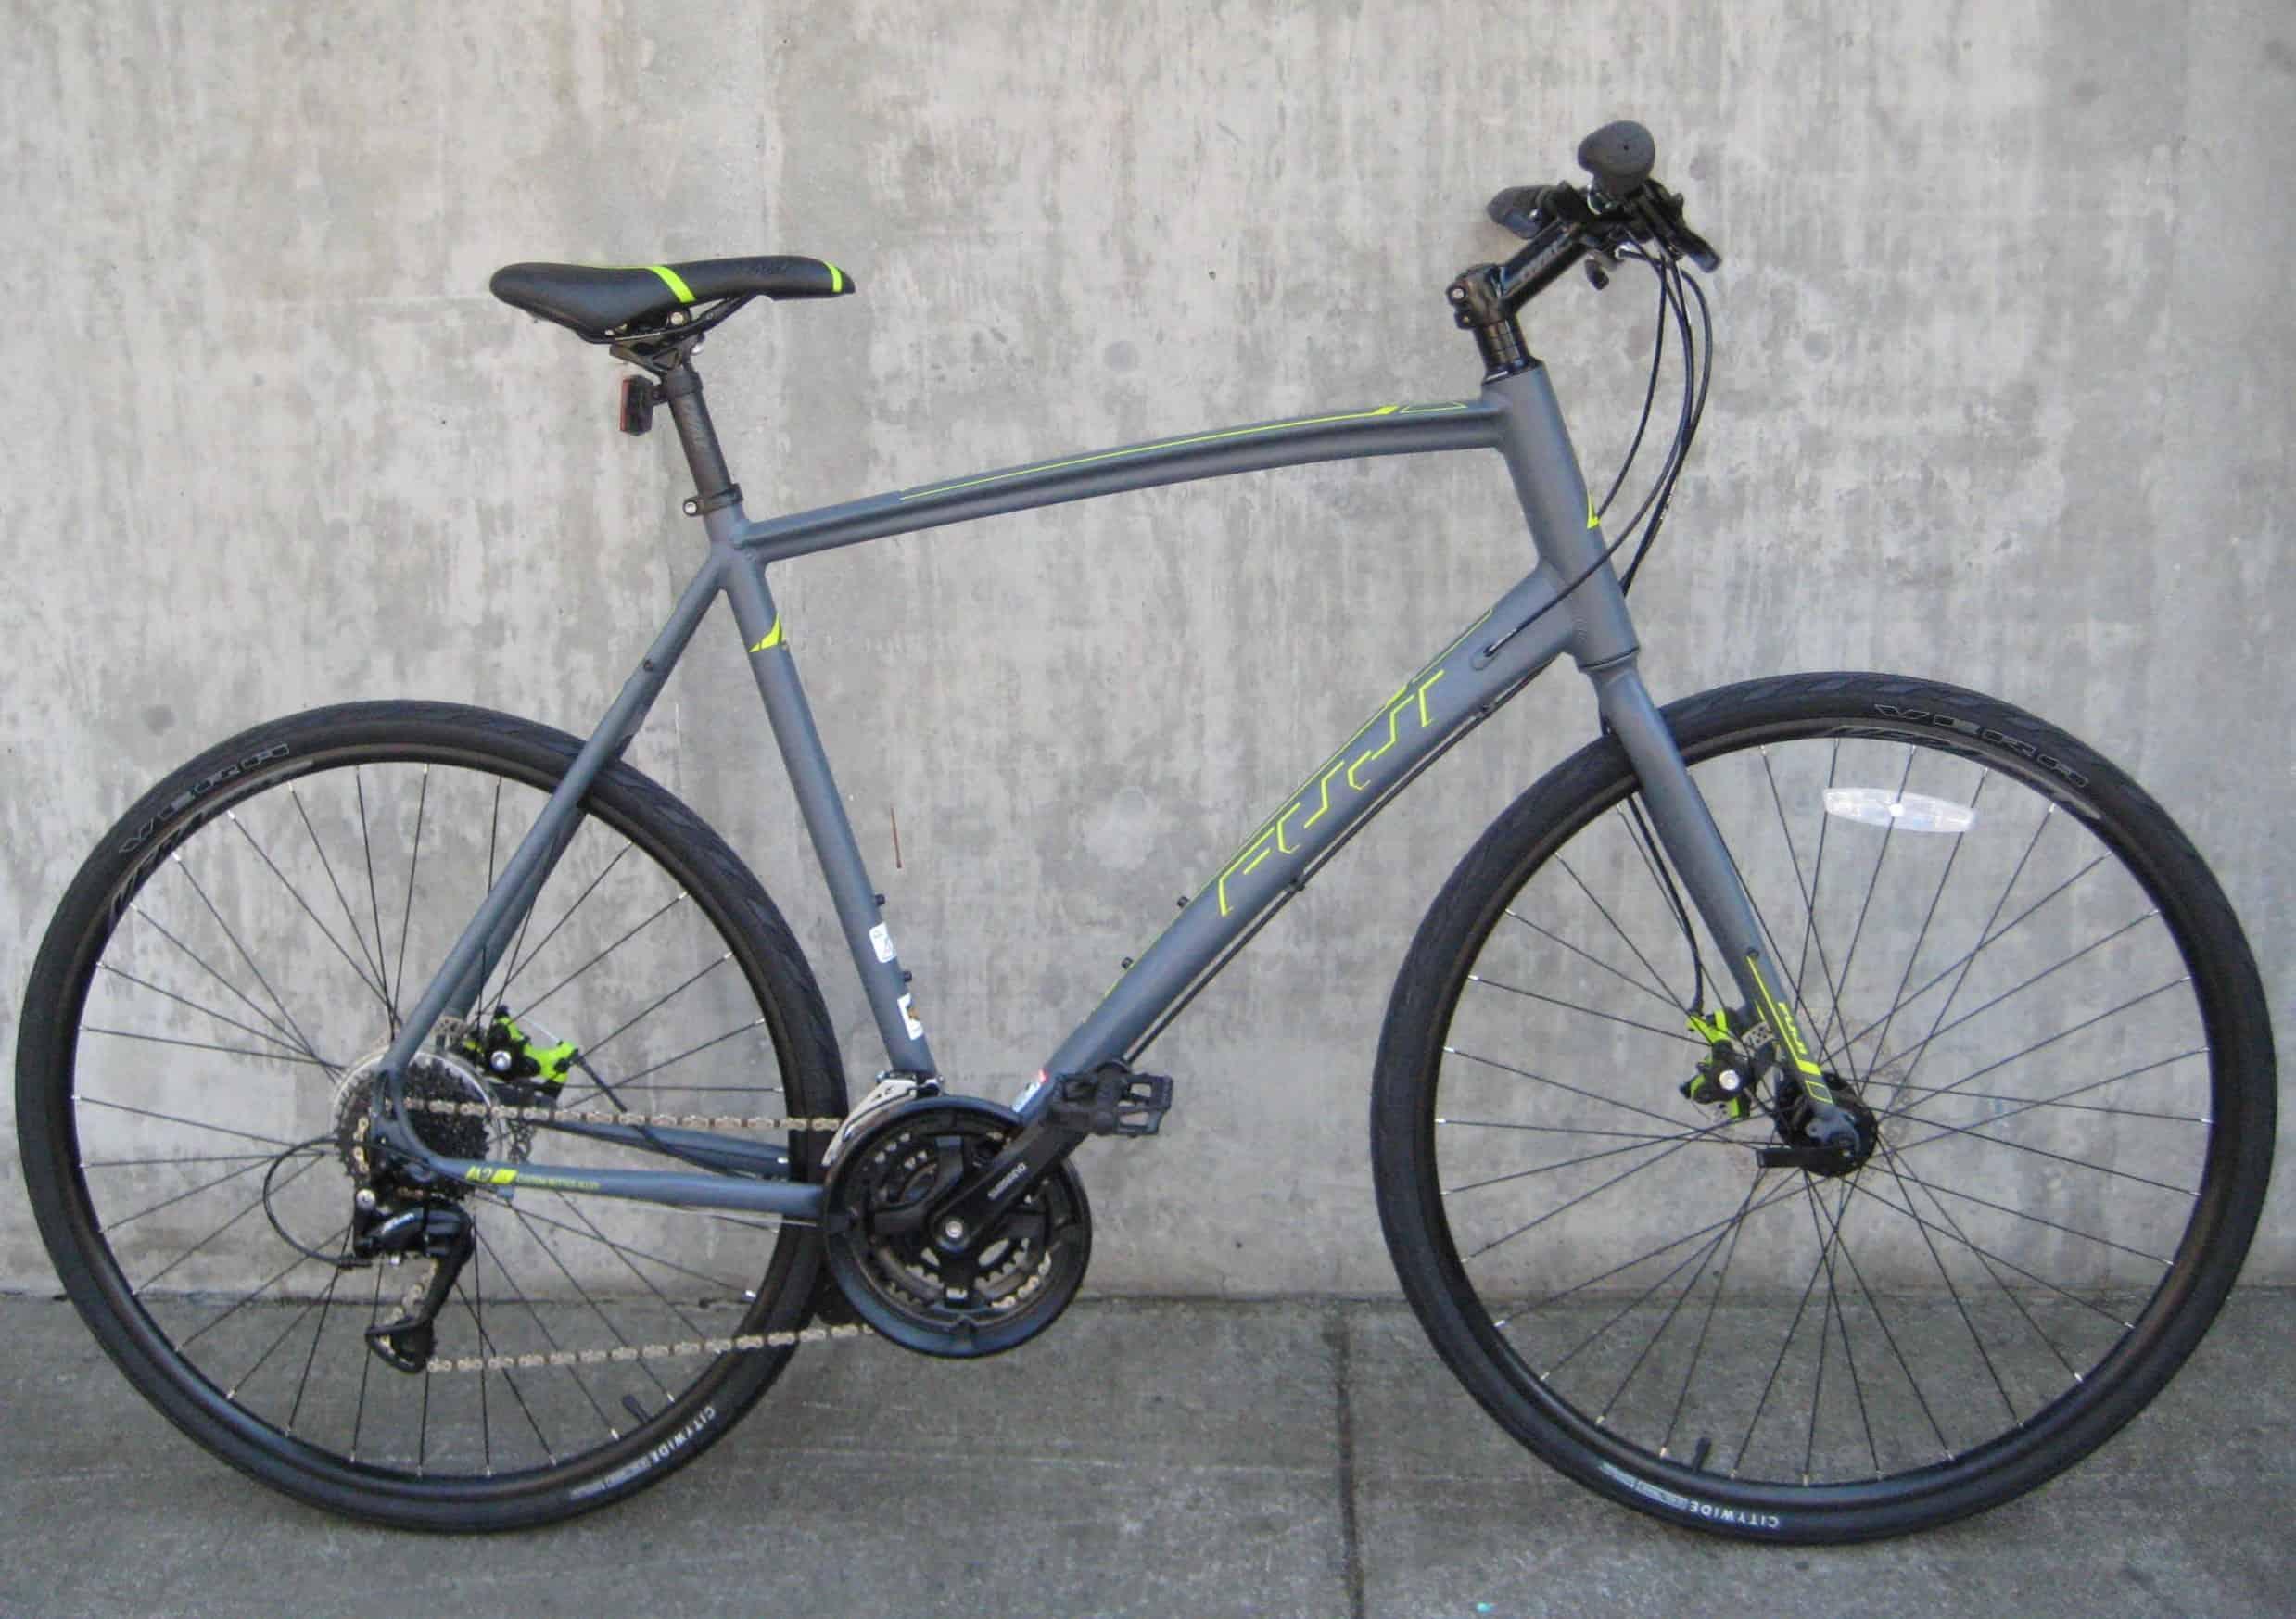 Choosing a Good Hybrid Bicycle